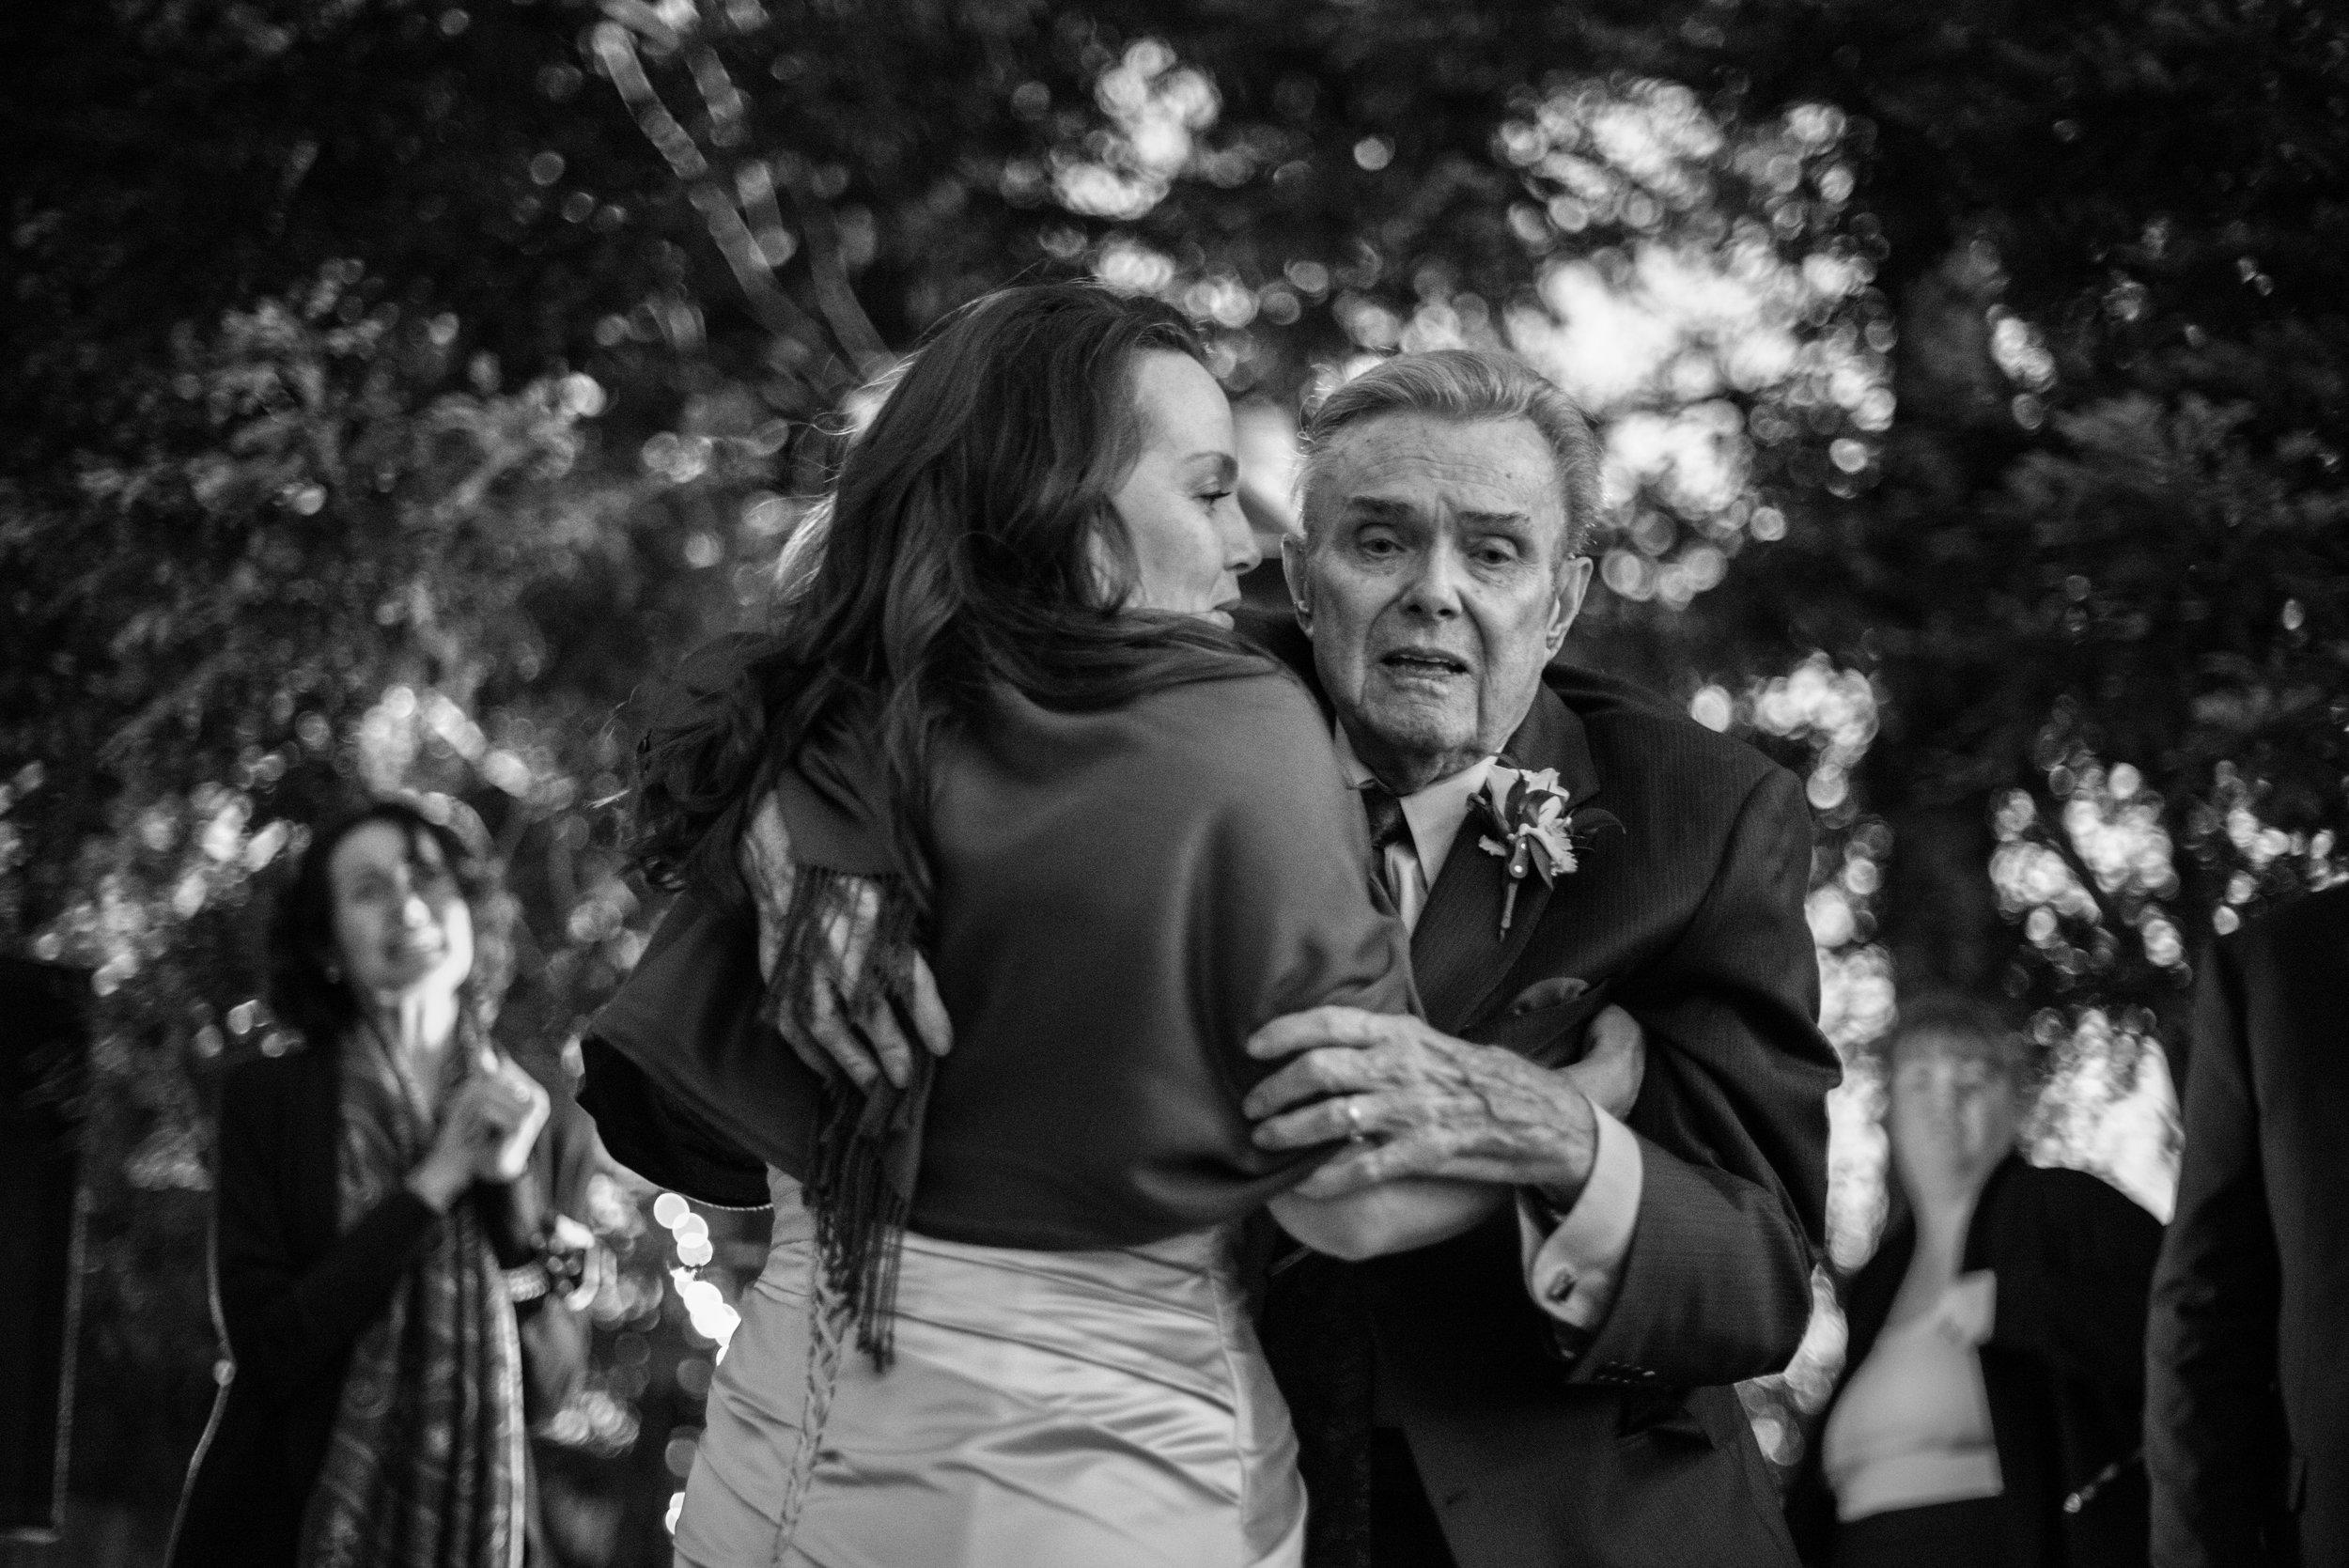 Seana and Terry_May_2019_GarrickWong-1498-2.jpg